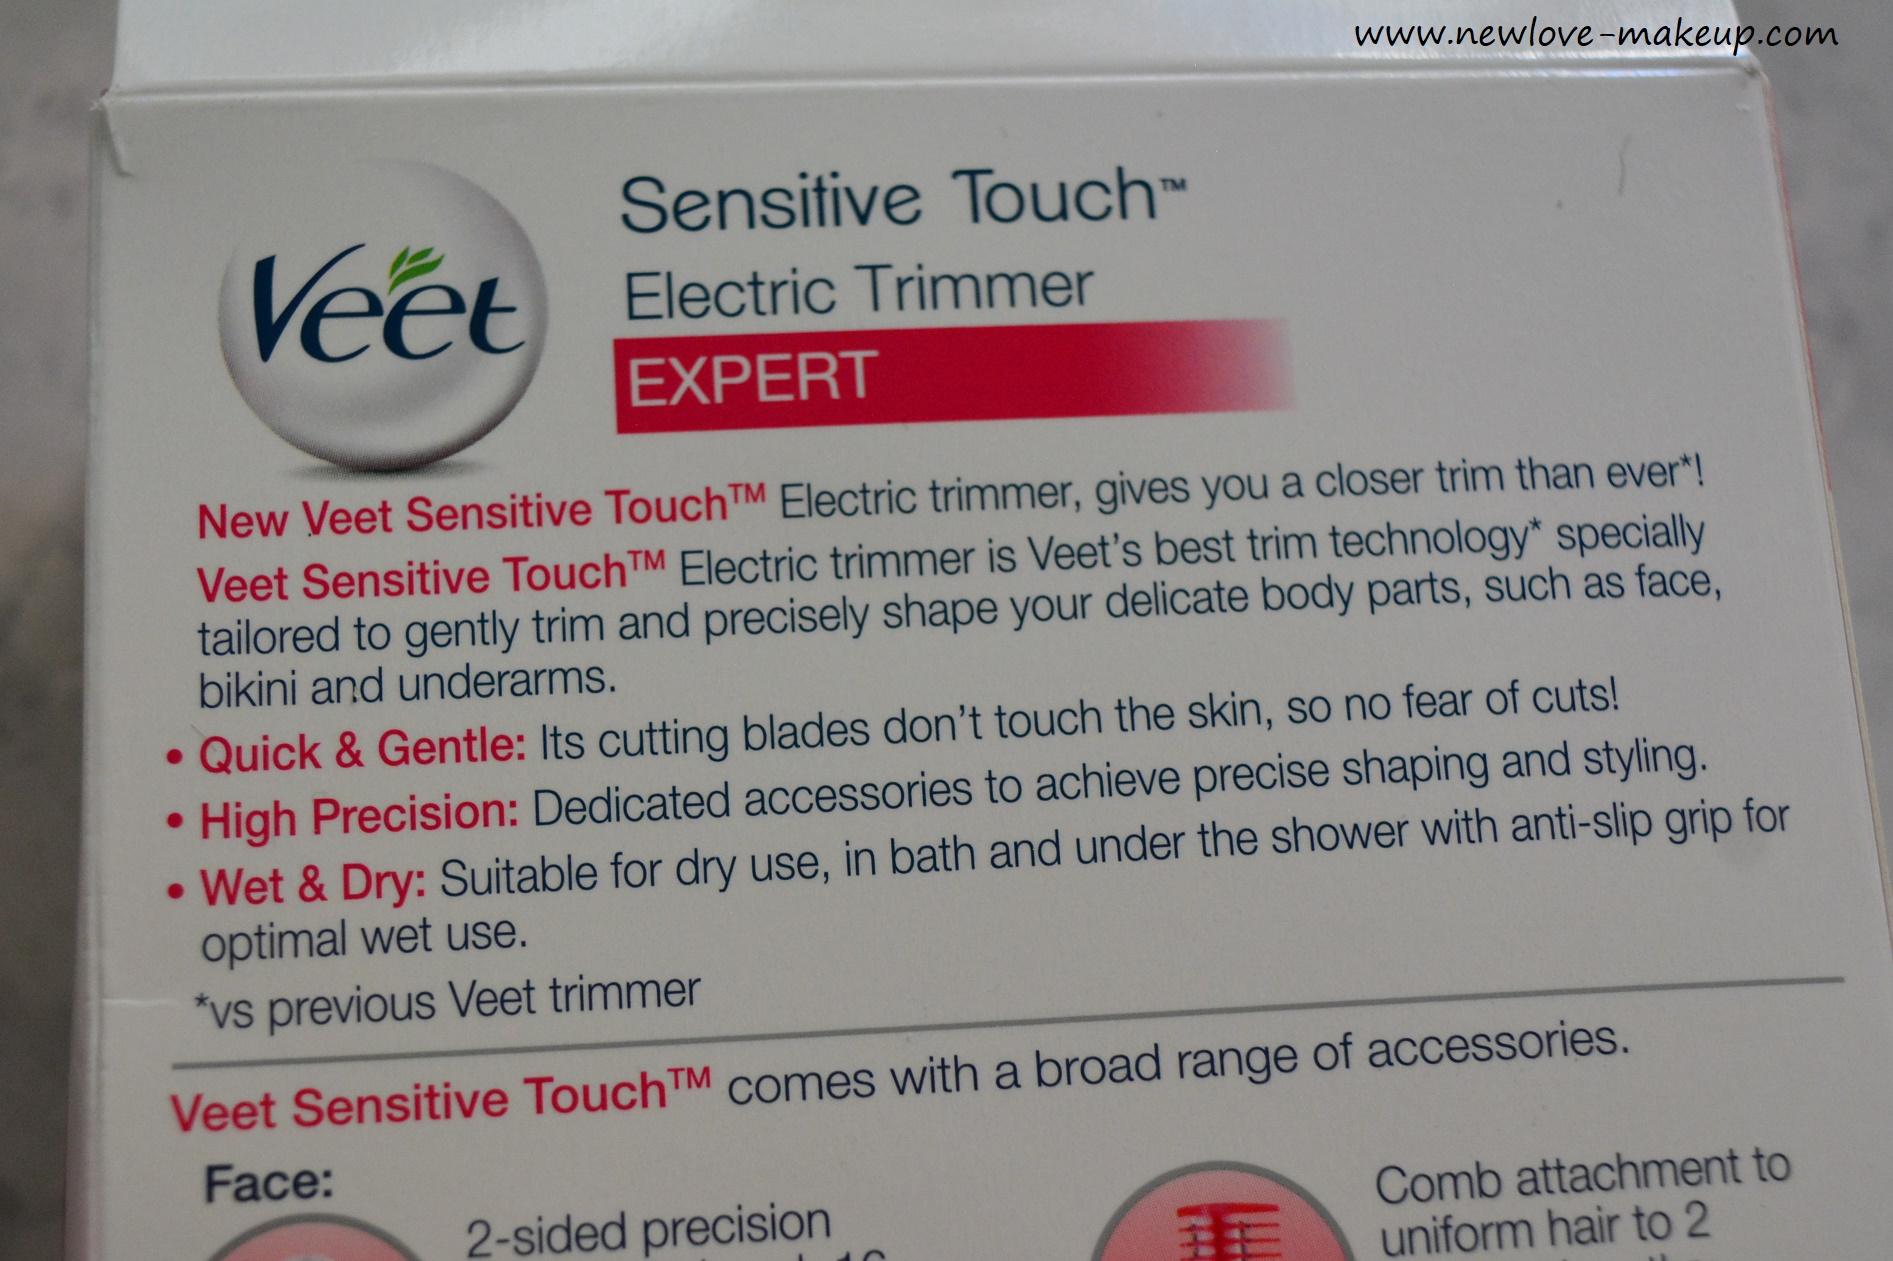 Veet Sensitive Touch Expert Beauty Trimmer Review